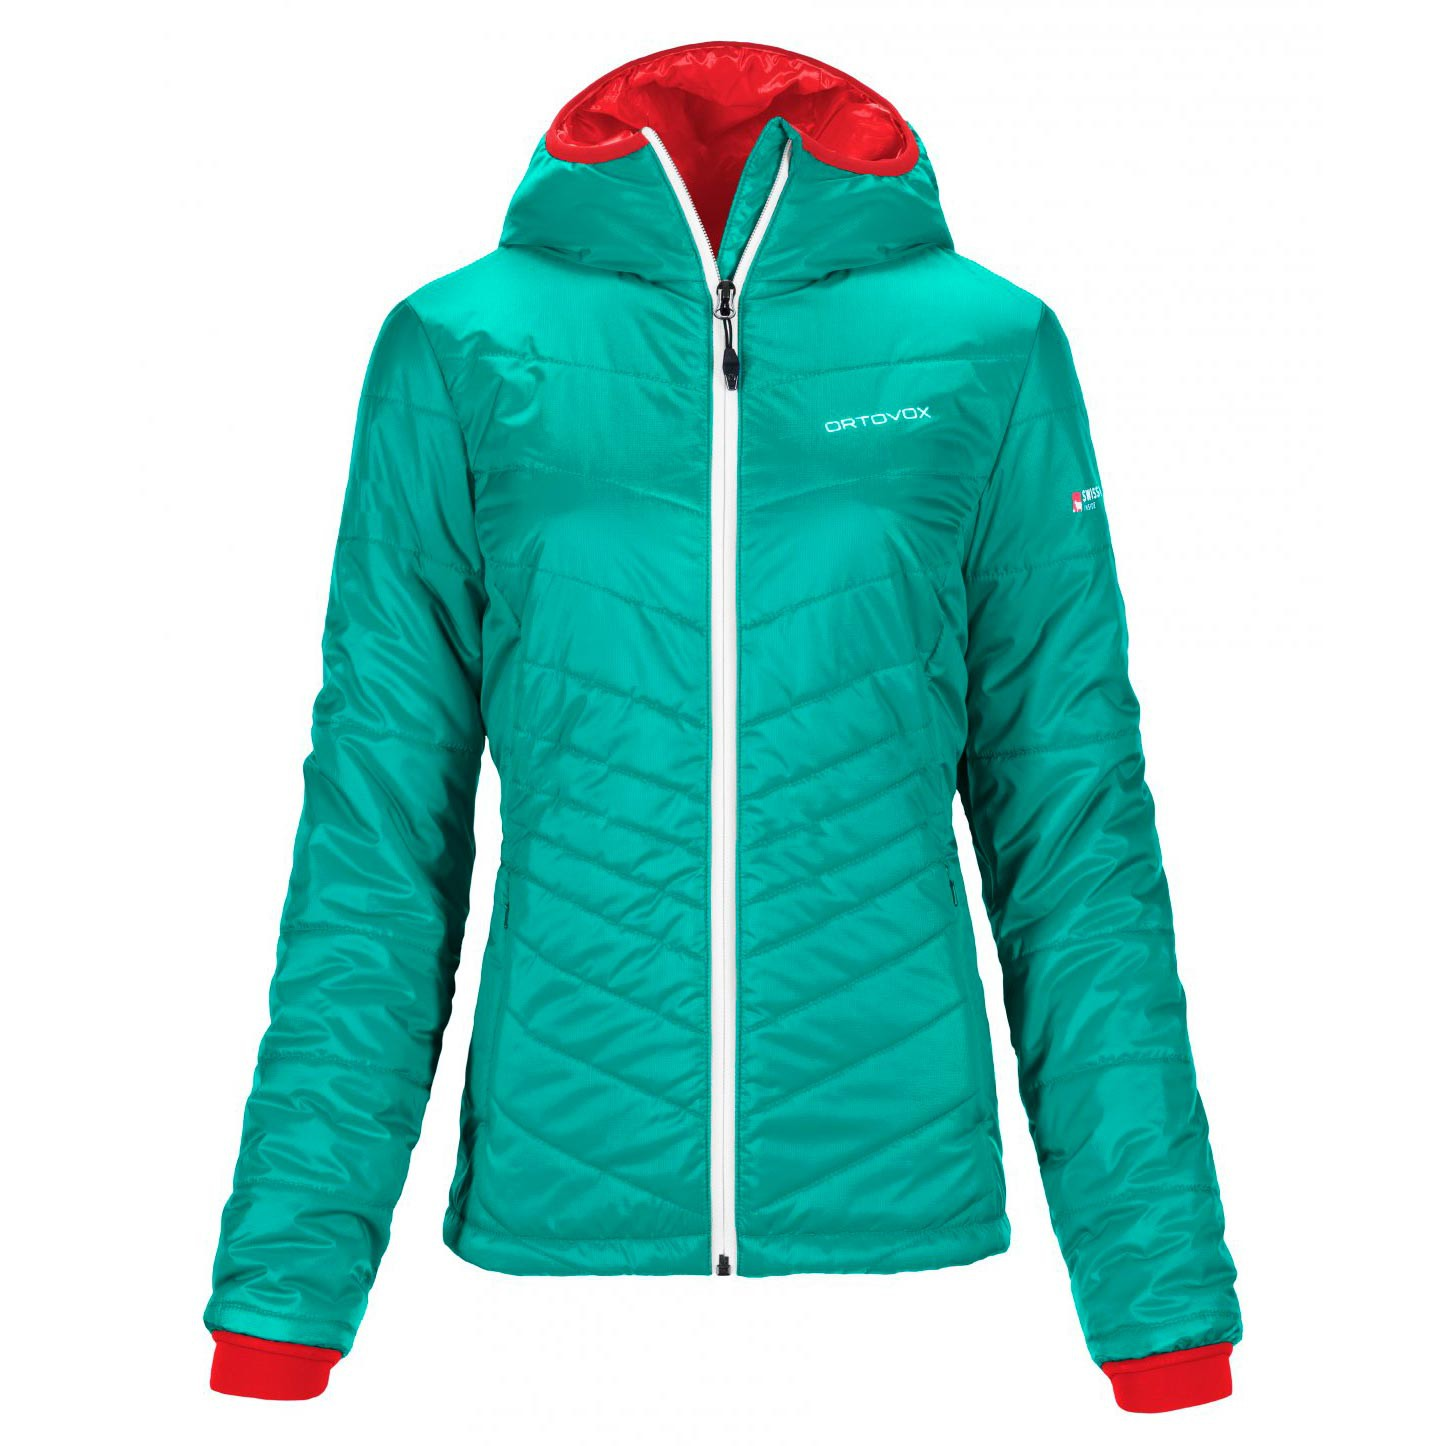 Ortovox Piz Bernina Jacket aqua